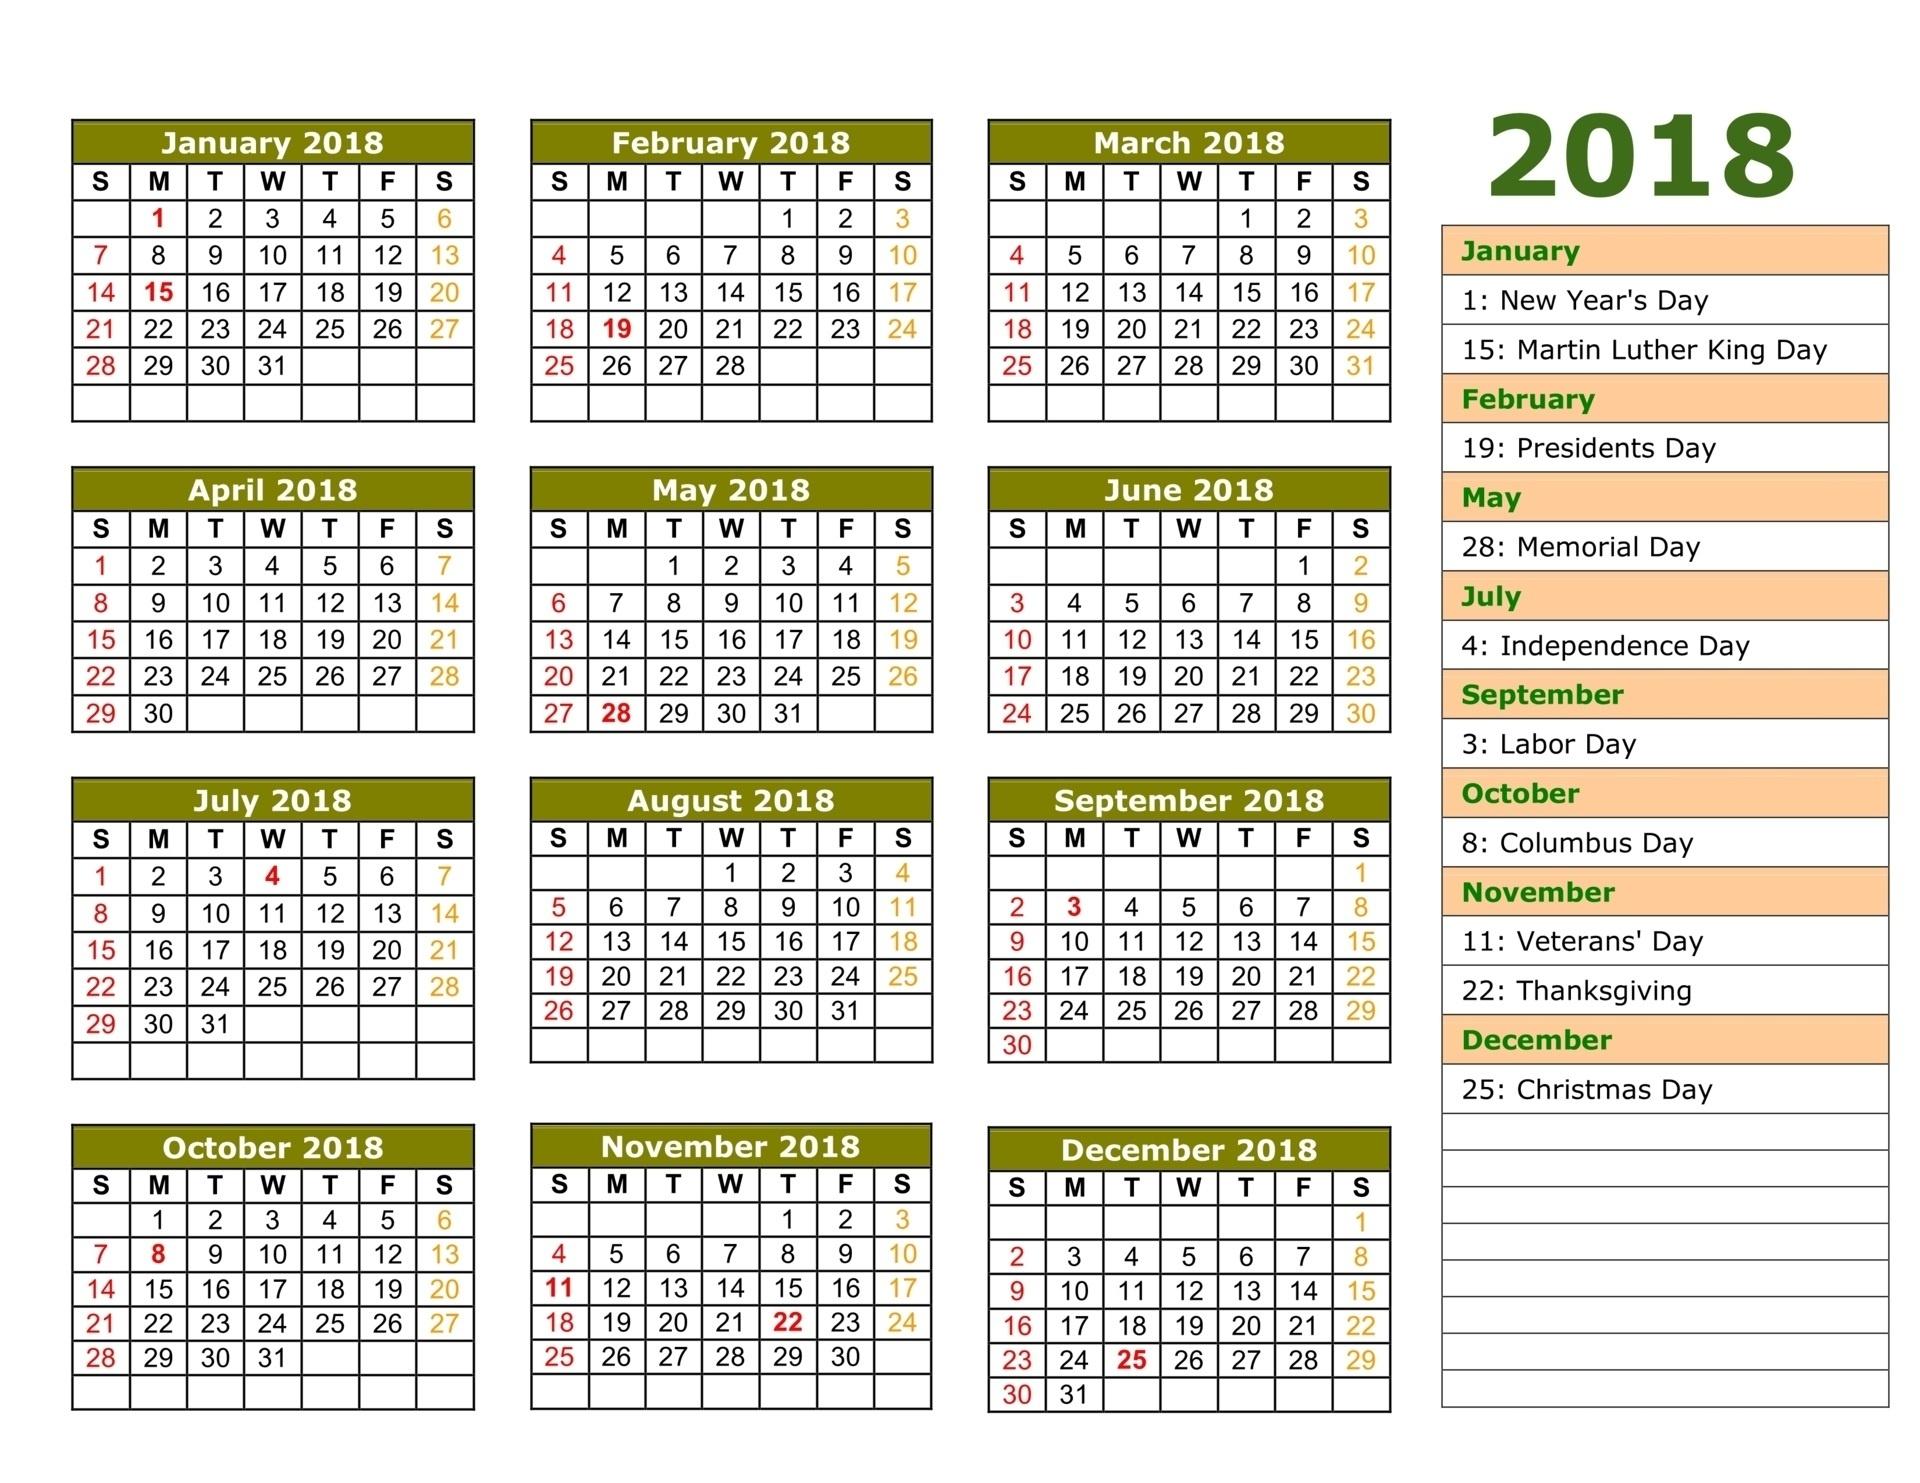 Islamic Calendar 2018 | Hijri Calendar 1439 | [Free} Printable  Ramadan Calendar Of Saudi Areabia